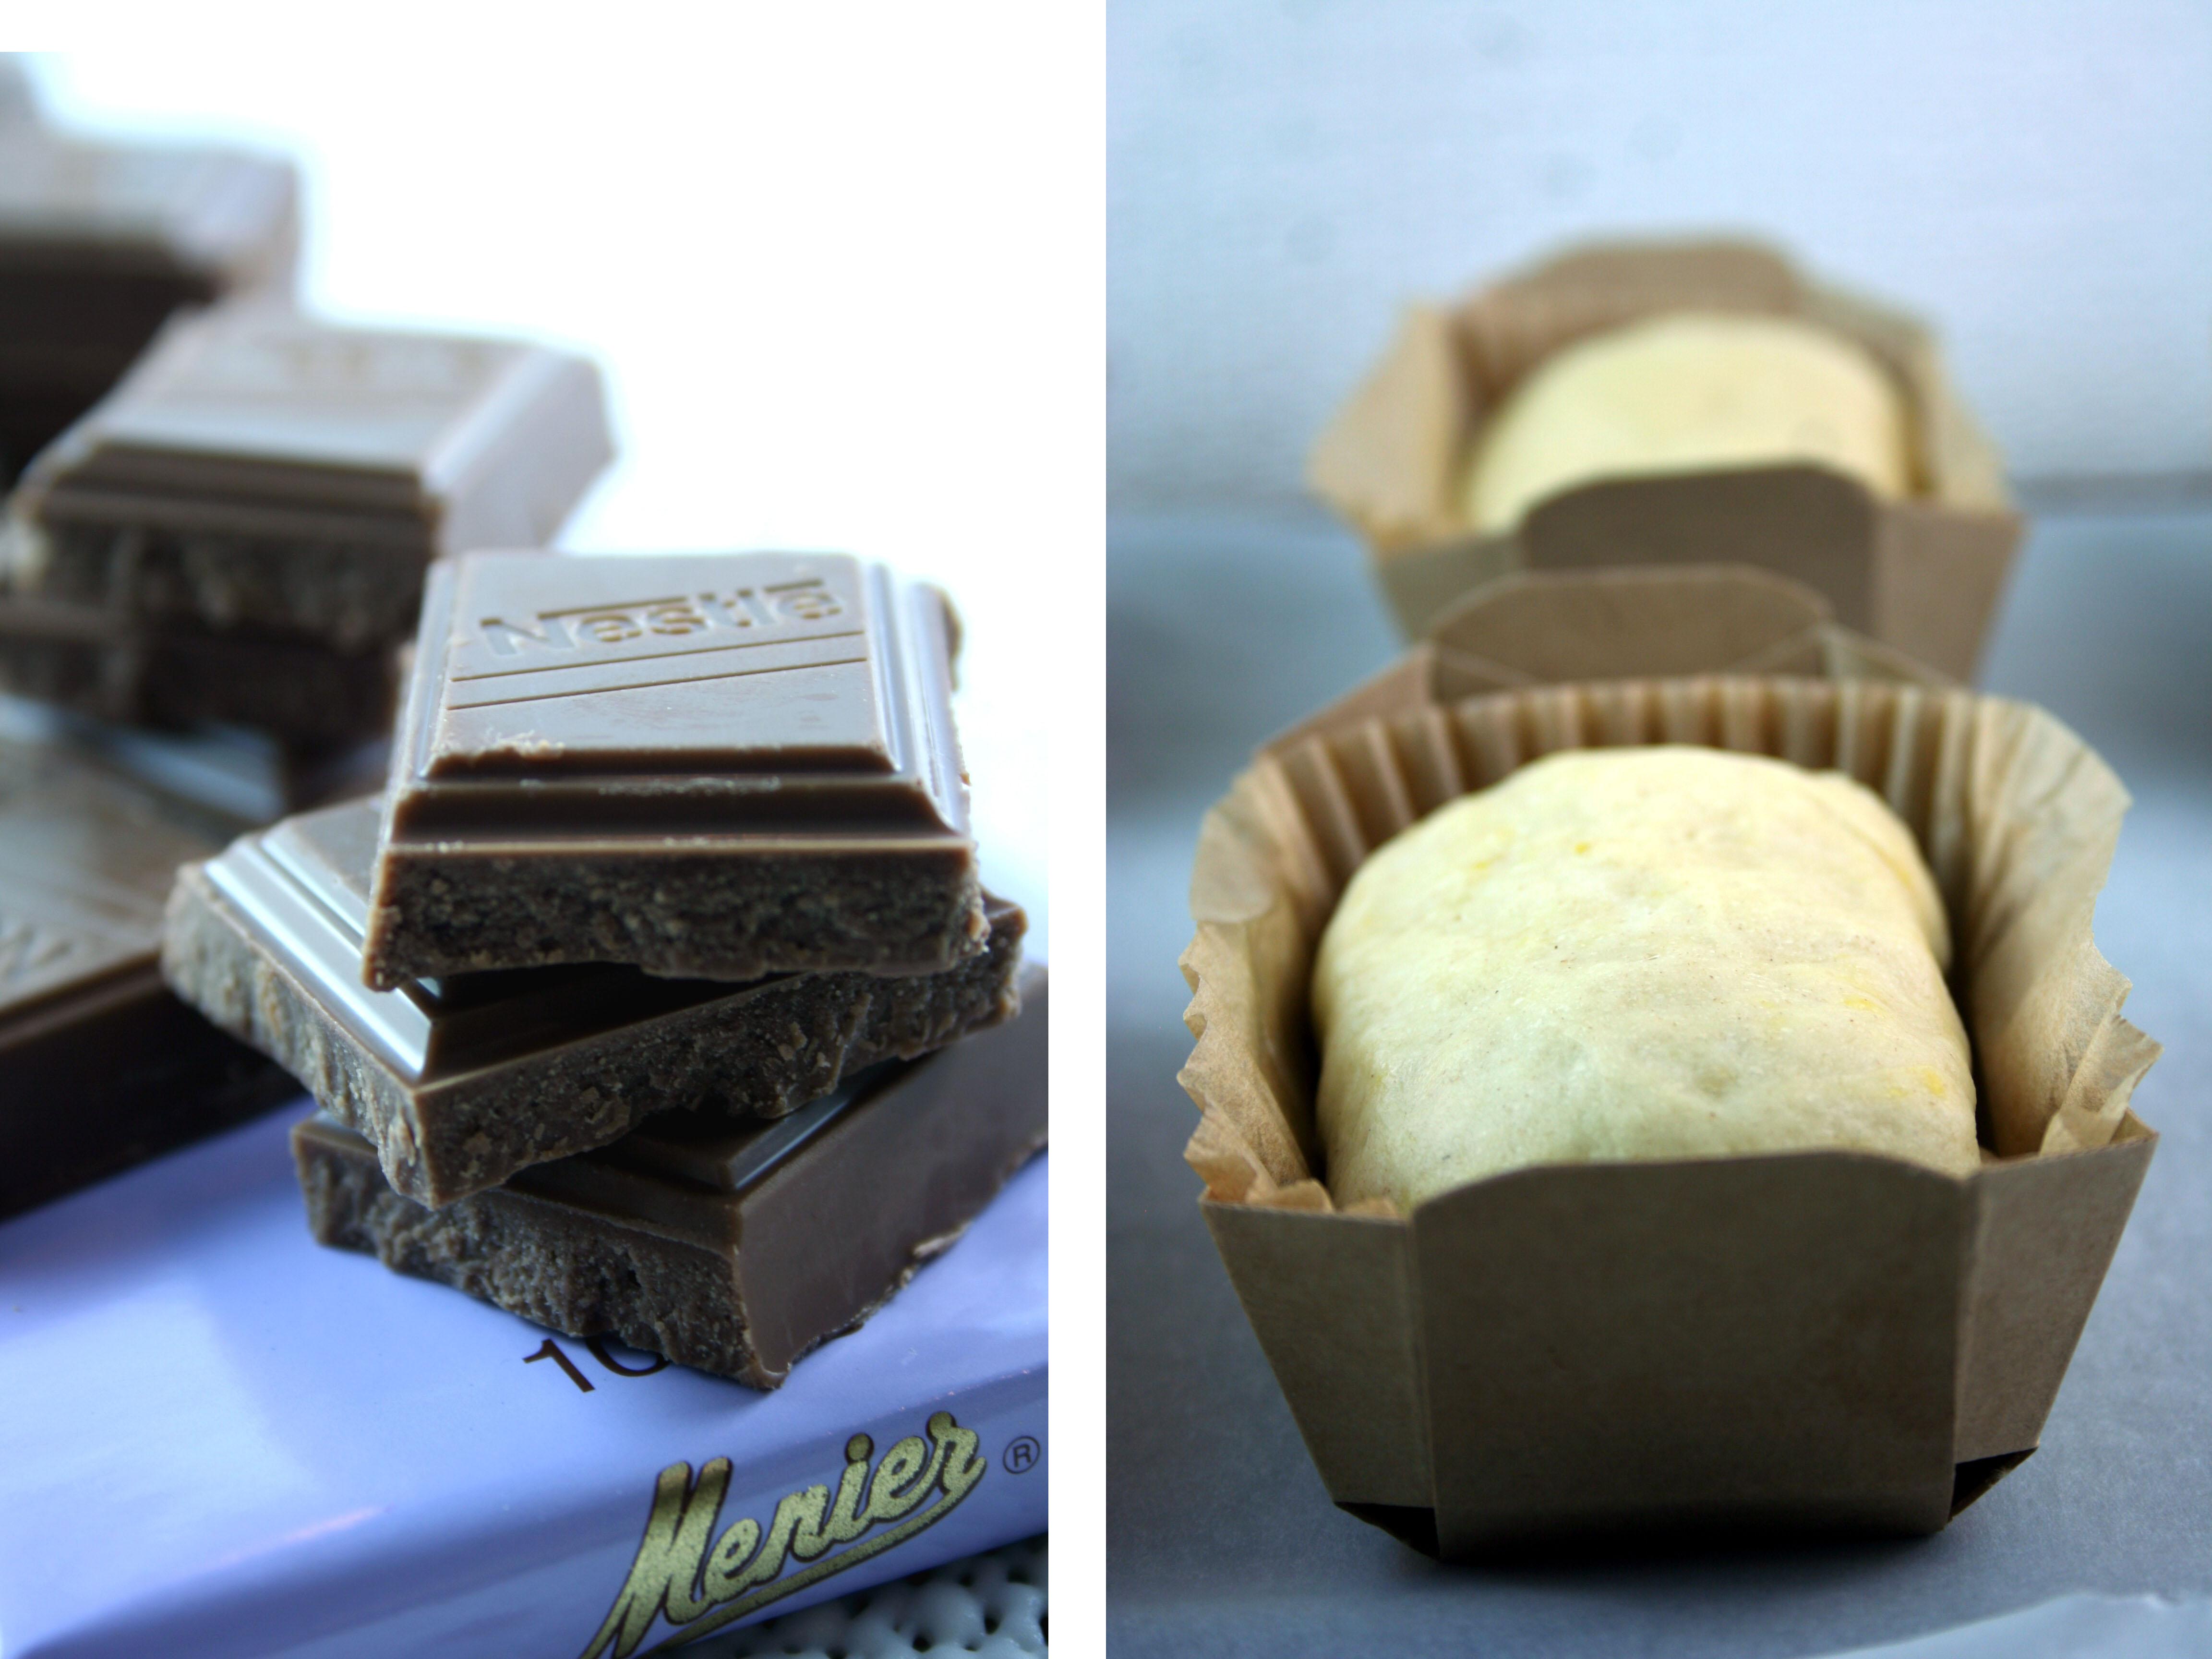 Chocolate architect coupon